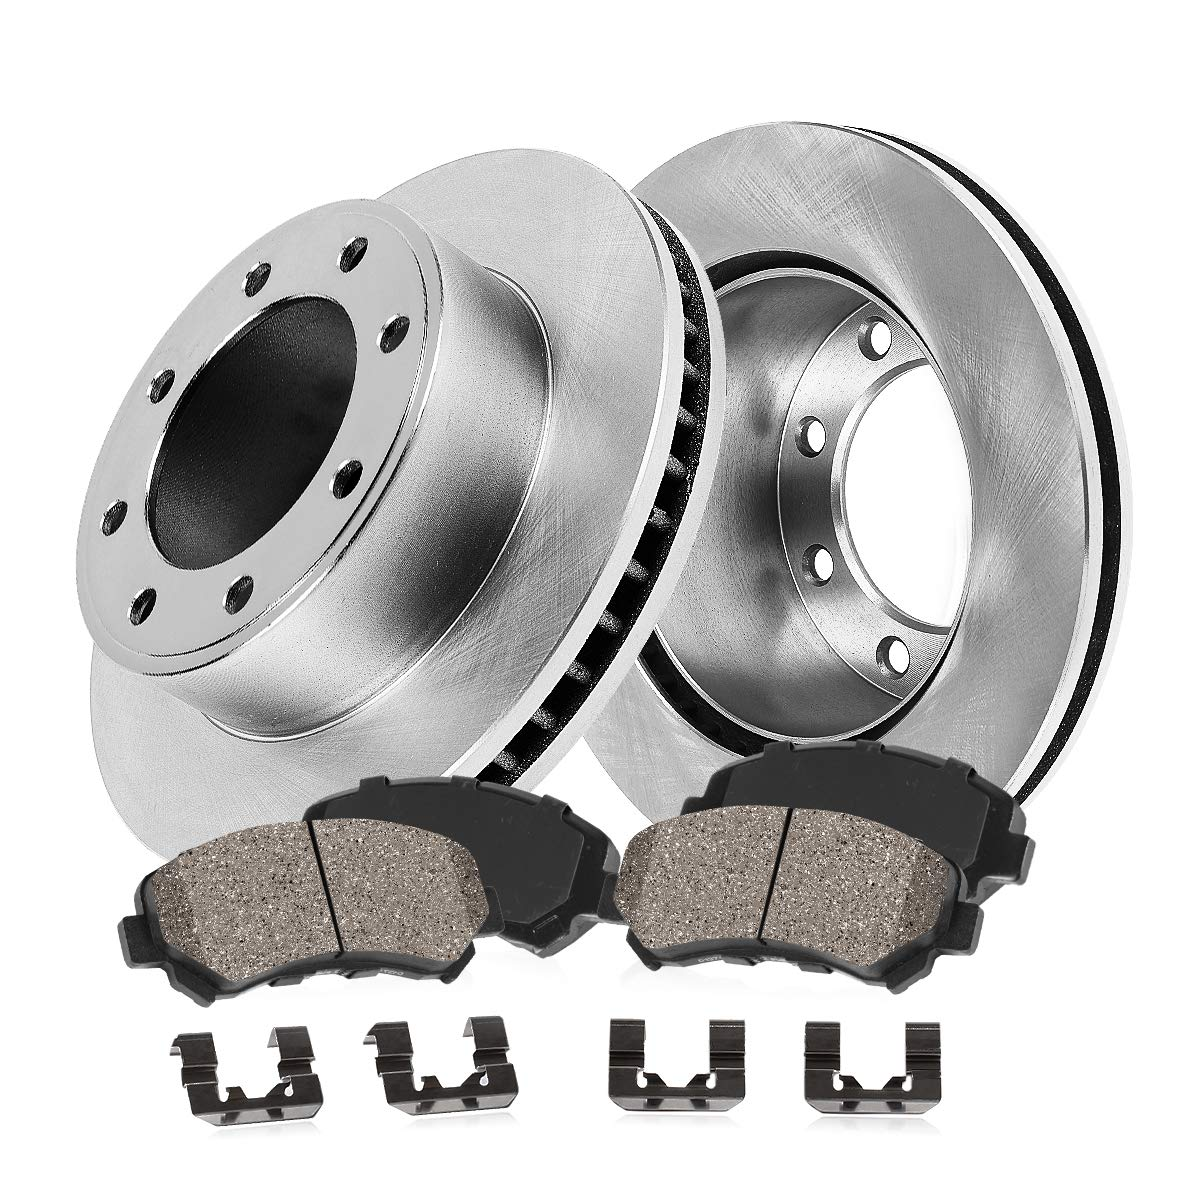 FRONT 324 mm Premium OE 8 Lug [2] Brake Disc Rotors + [4] Ceramic Brake Pads + Clips Callahan Brake Parts